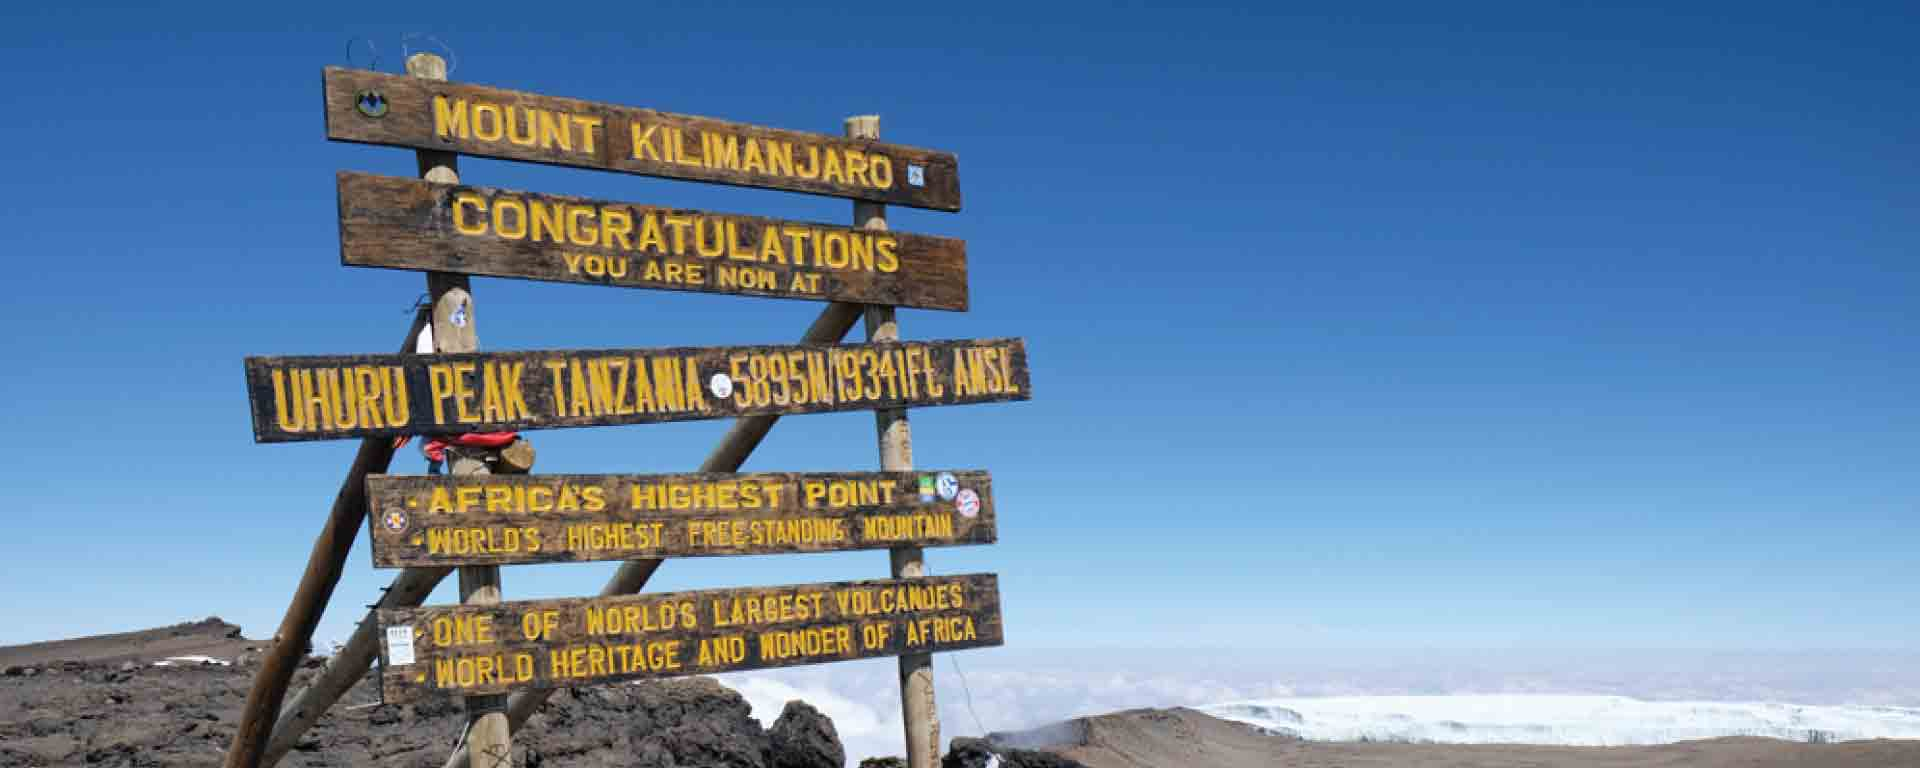 Mount Kilimanjaro Climbing Expeditions